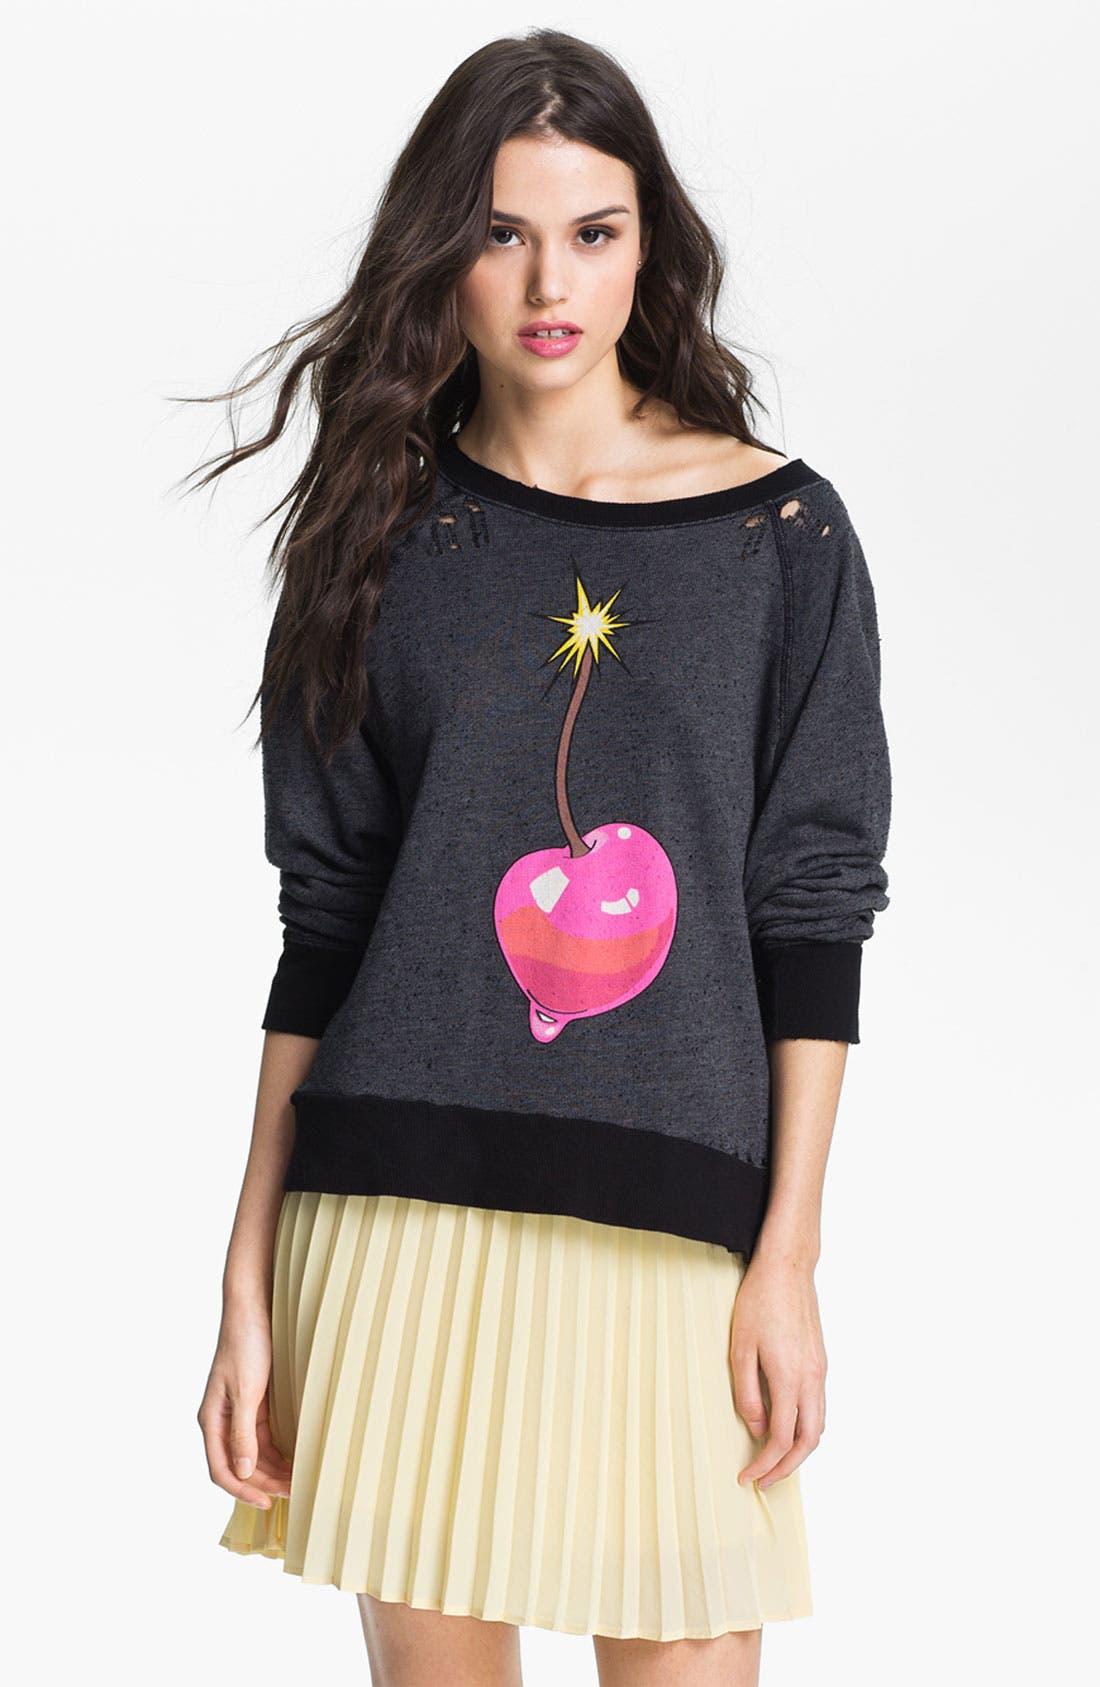 Alternate Image 1 Selected - Wildfox 'Cherry Bomb' Destroyed Sweatshirt (Nordstrom Exclusive)